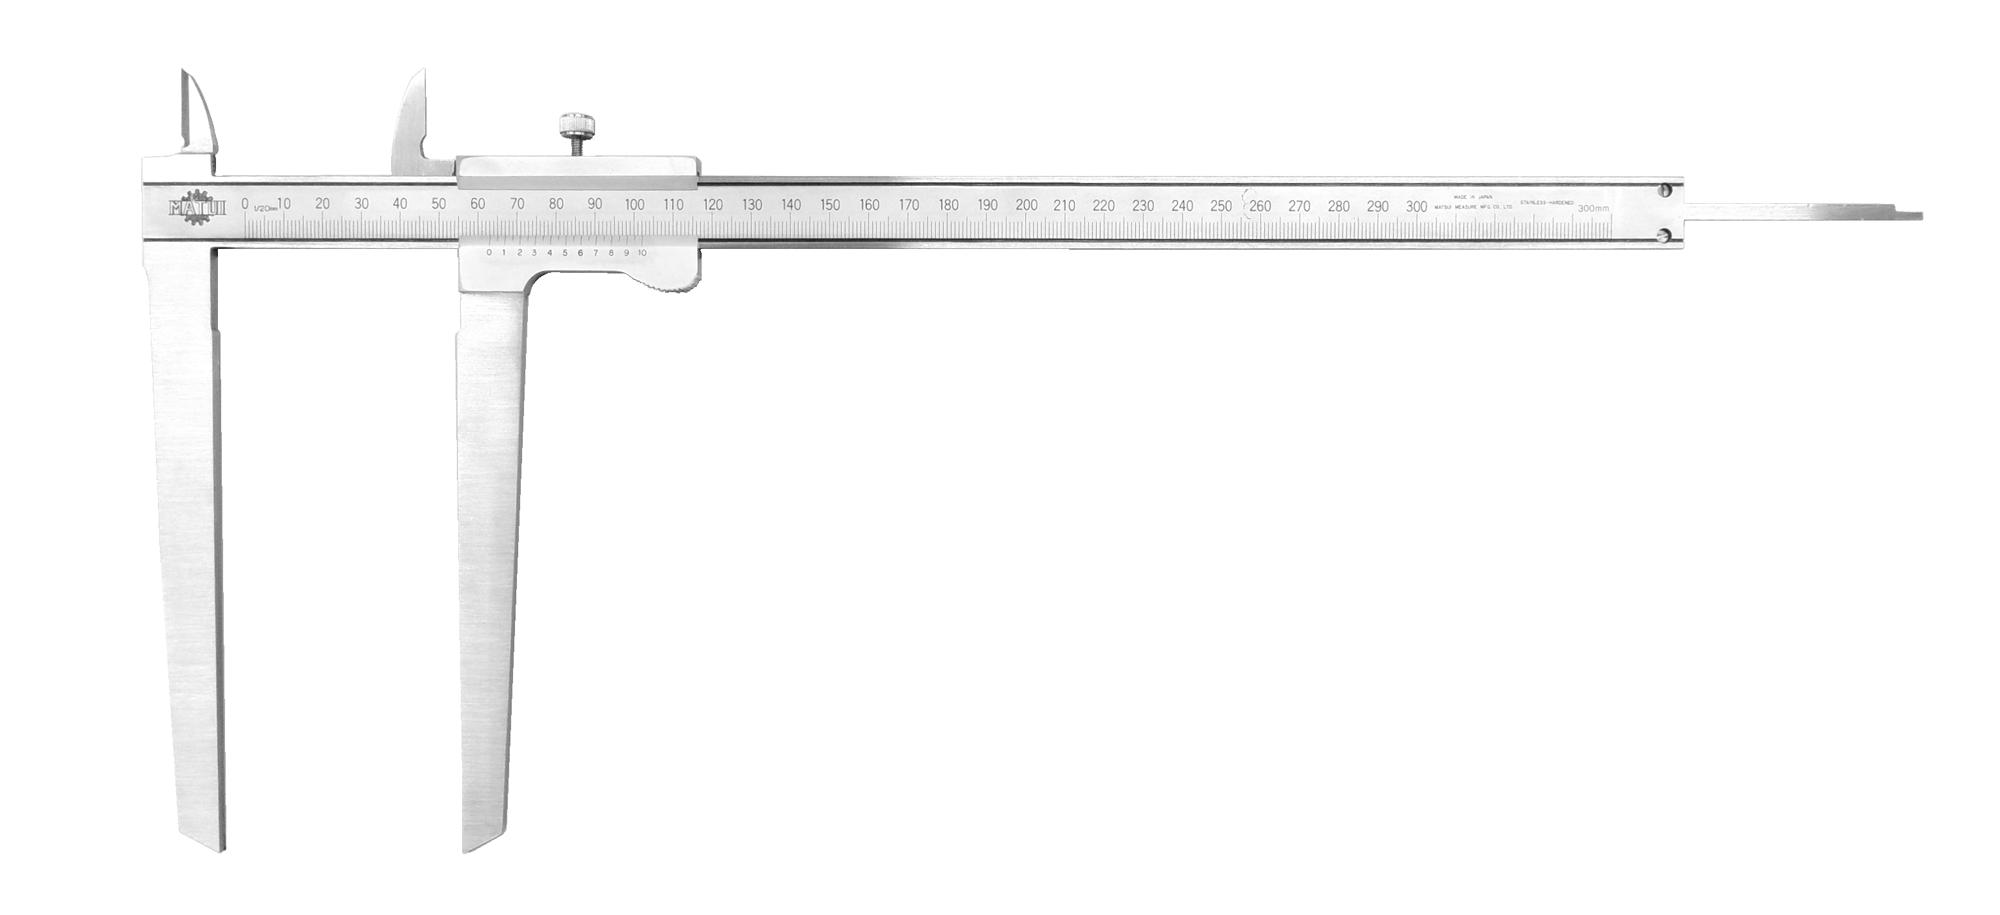 フロー値測定尺(最少0.05mm・最大300mm)